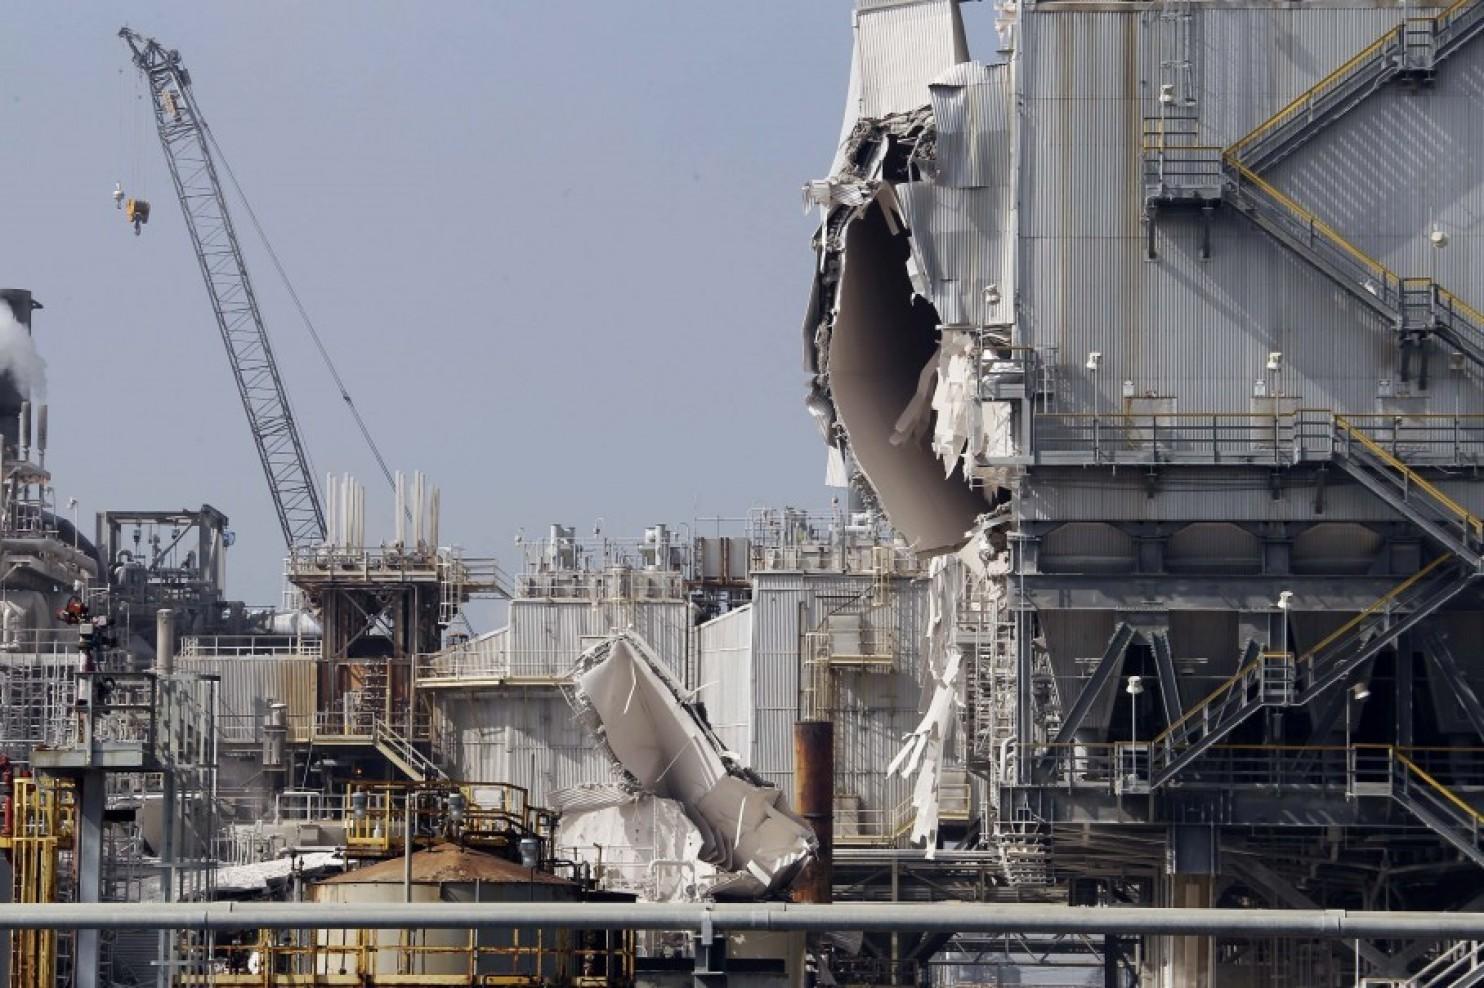 Exxon Torrance oil refinery explosion 2